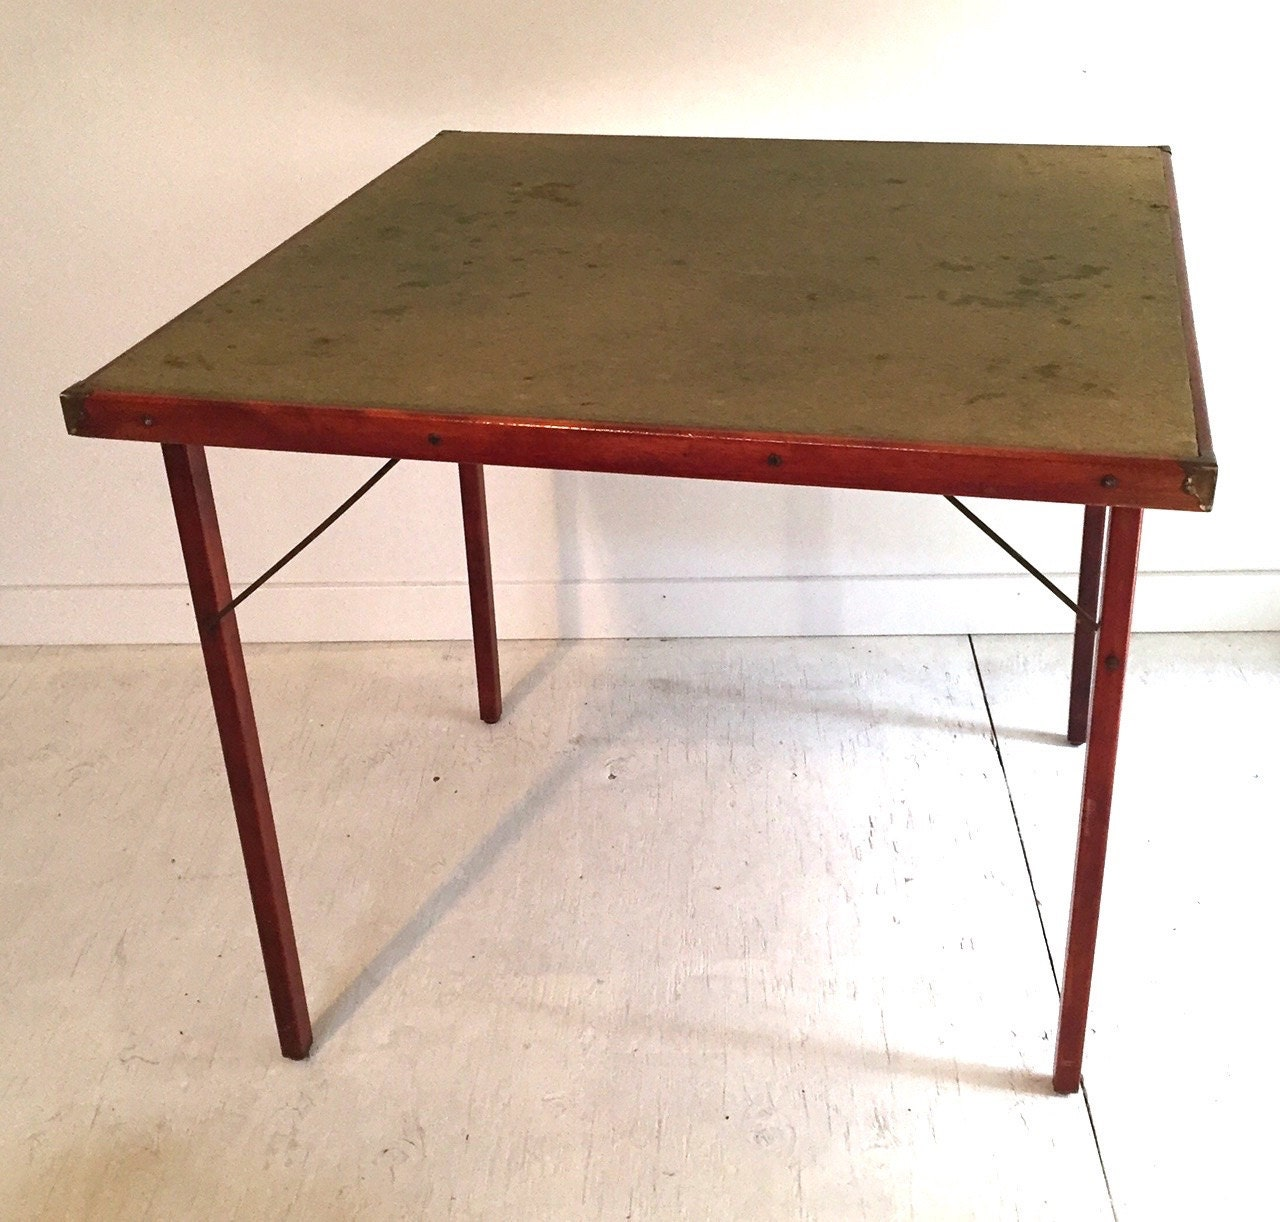 antique burrowes folding card game table. Black Bedroom Furniture Sets. Home Design Ideas